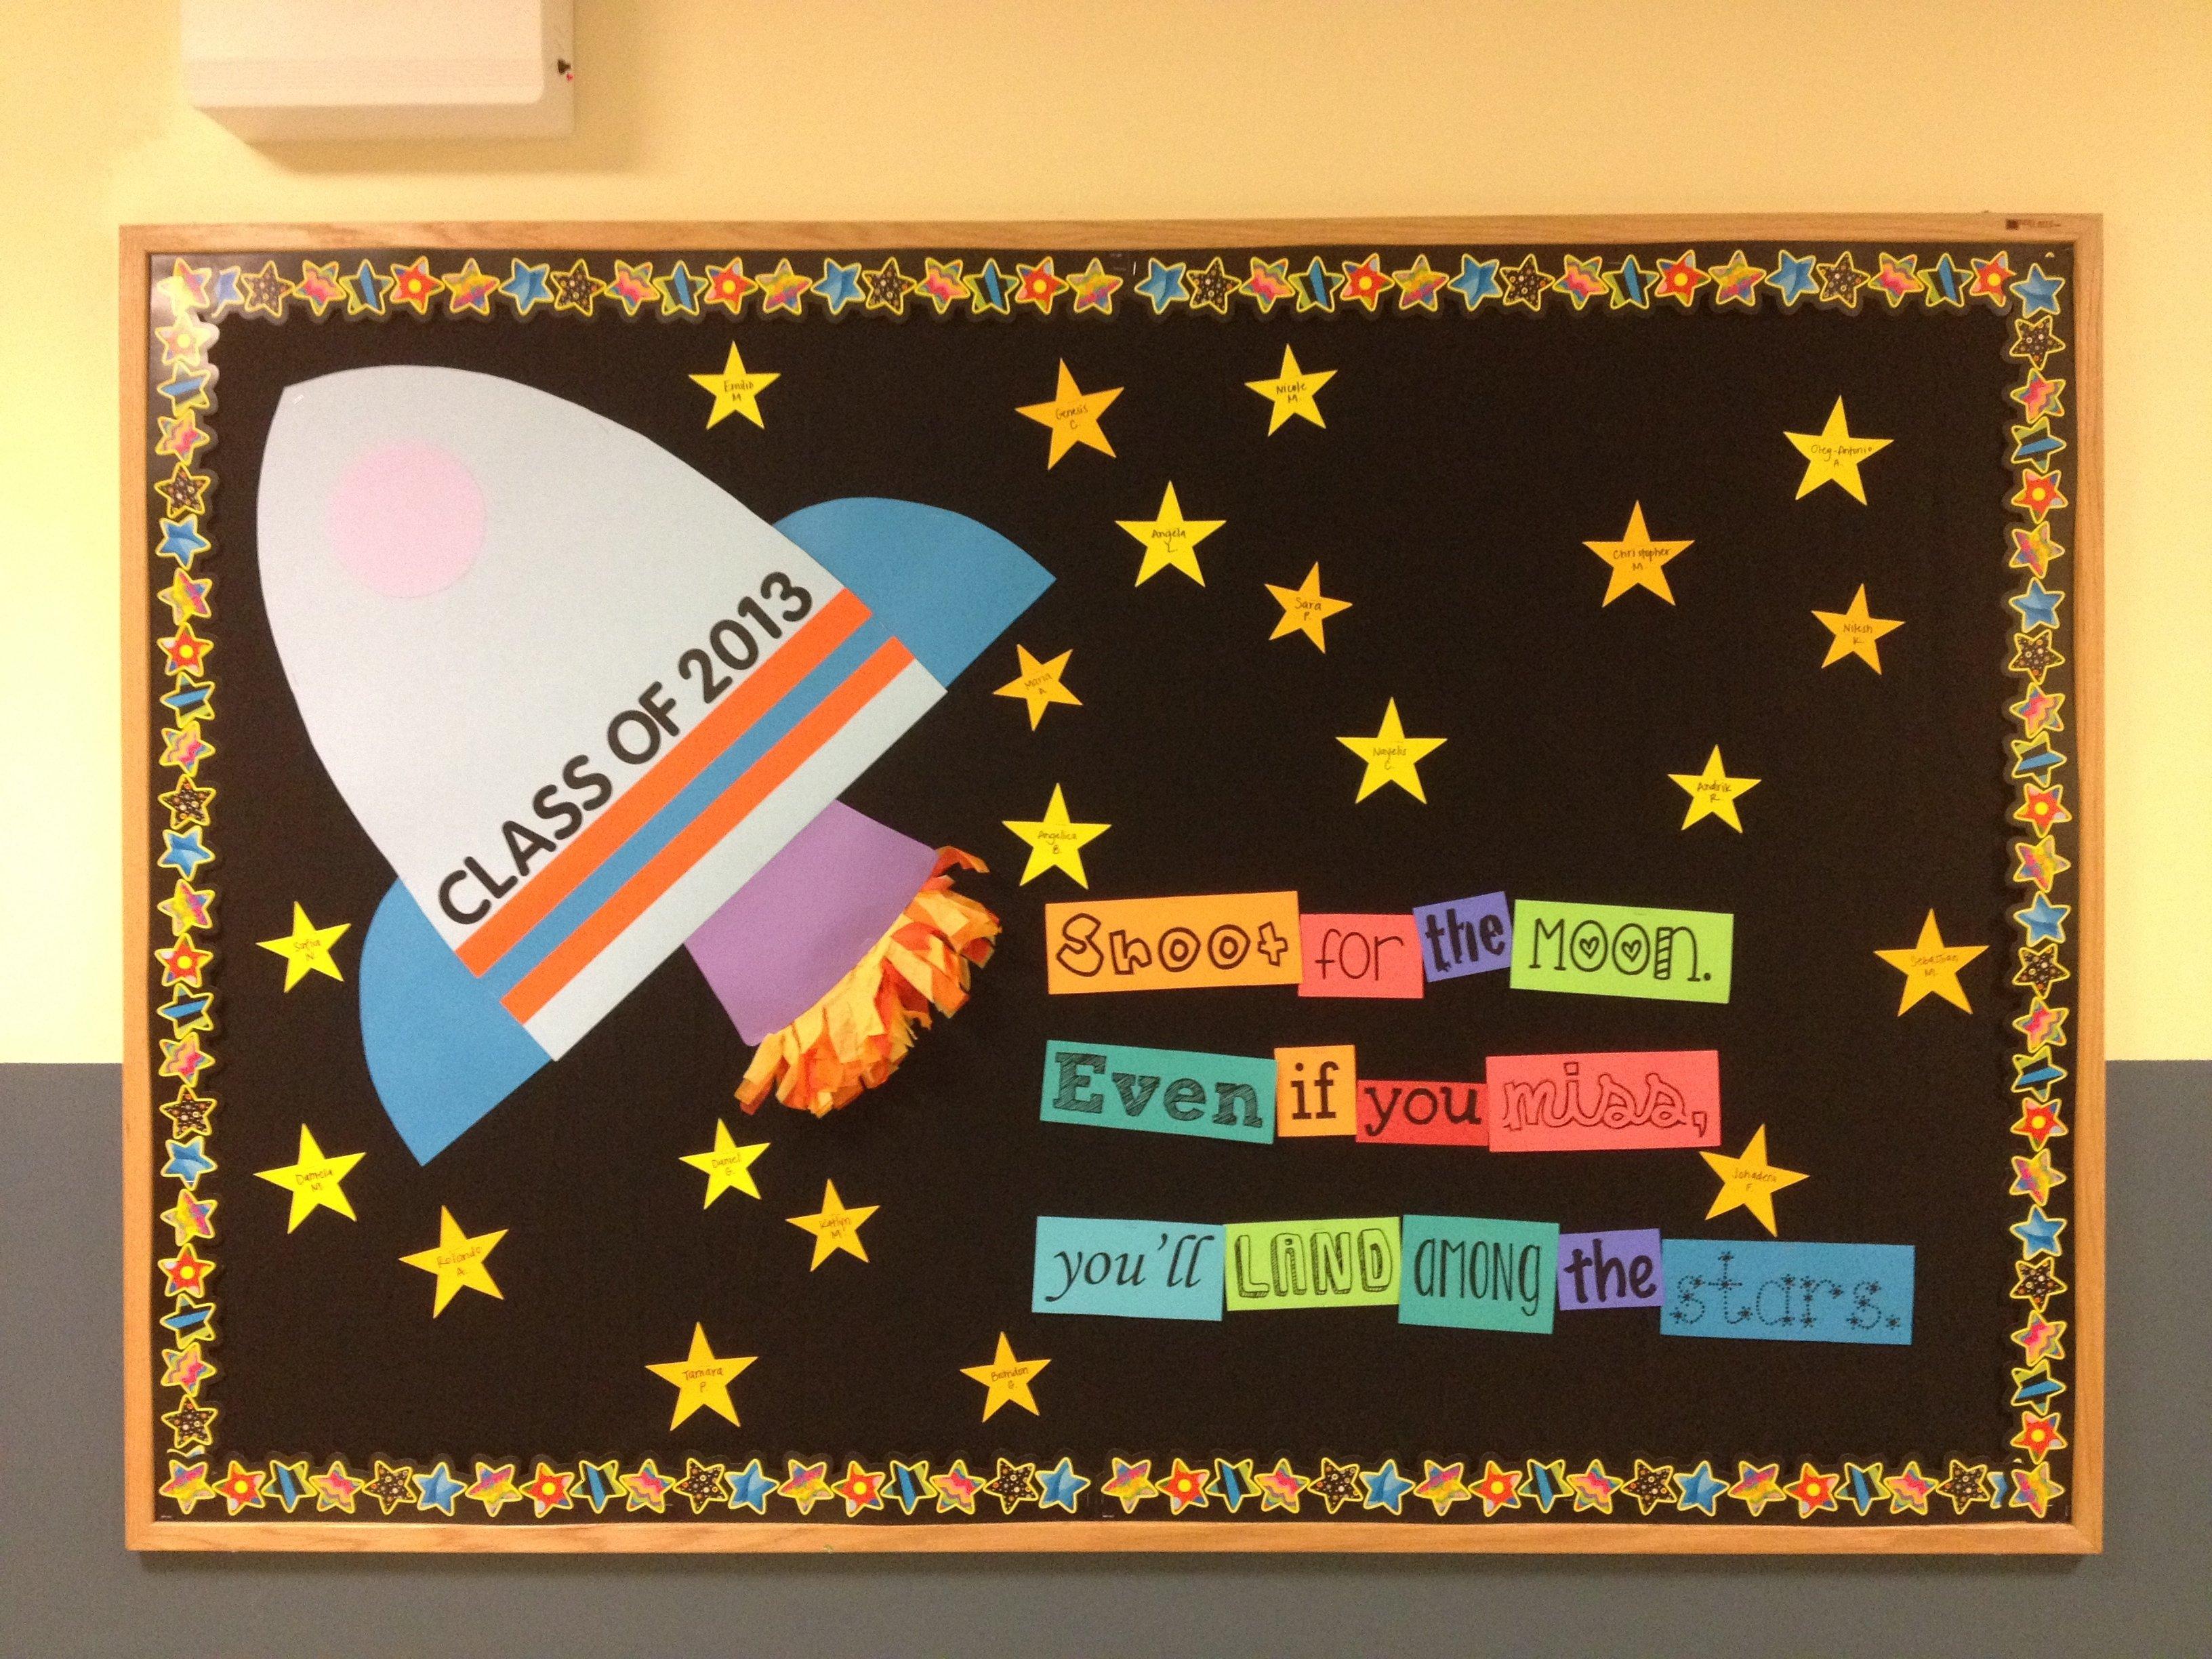 10 Elegant Bulletin Board Ideas For Back To School shoot for the moon bulletin board 5th grade back to school 1 2021